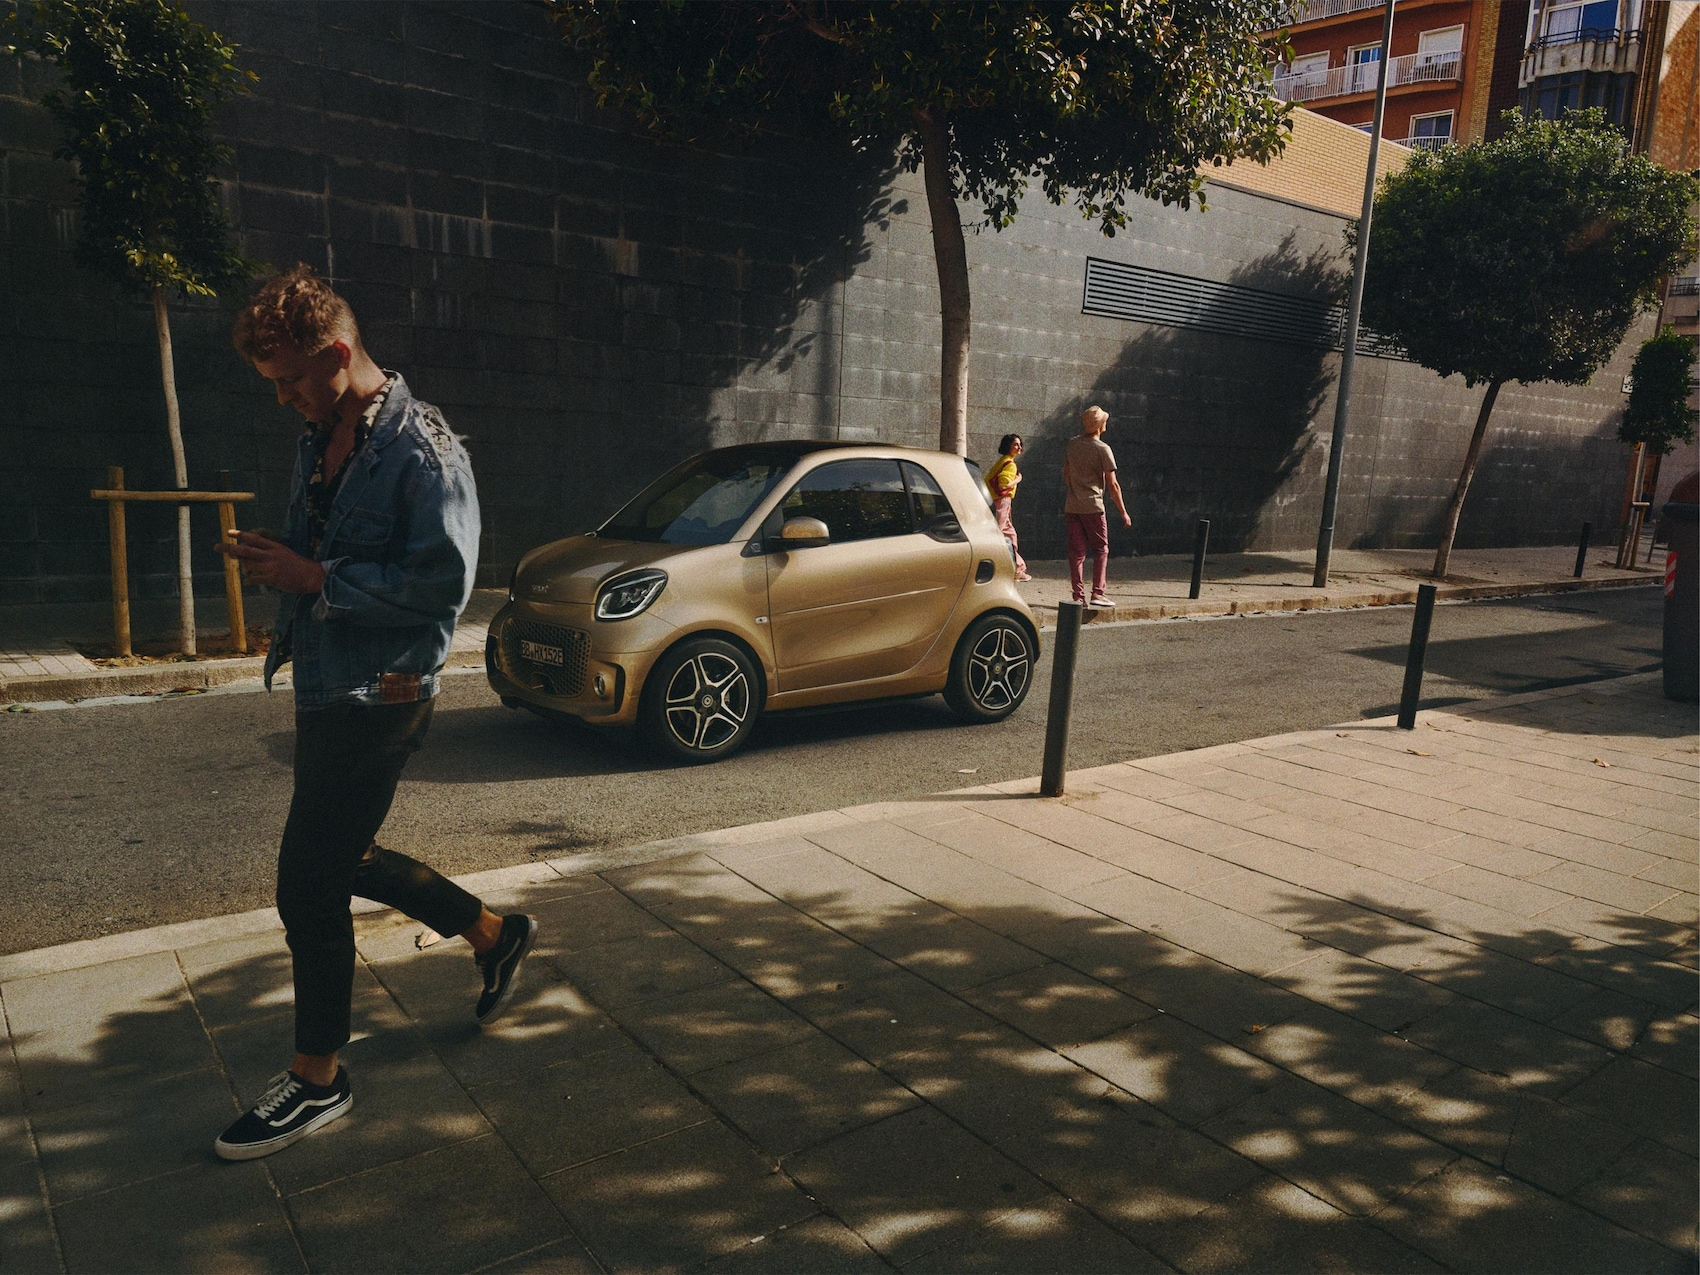 Un smart EQ fortwo en la calzada con peatones.